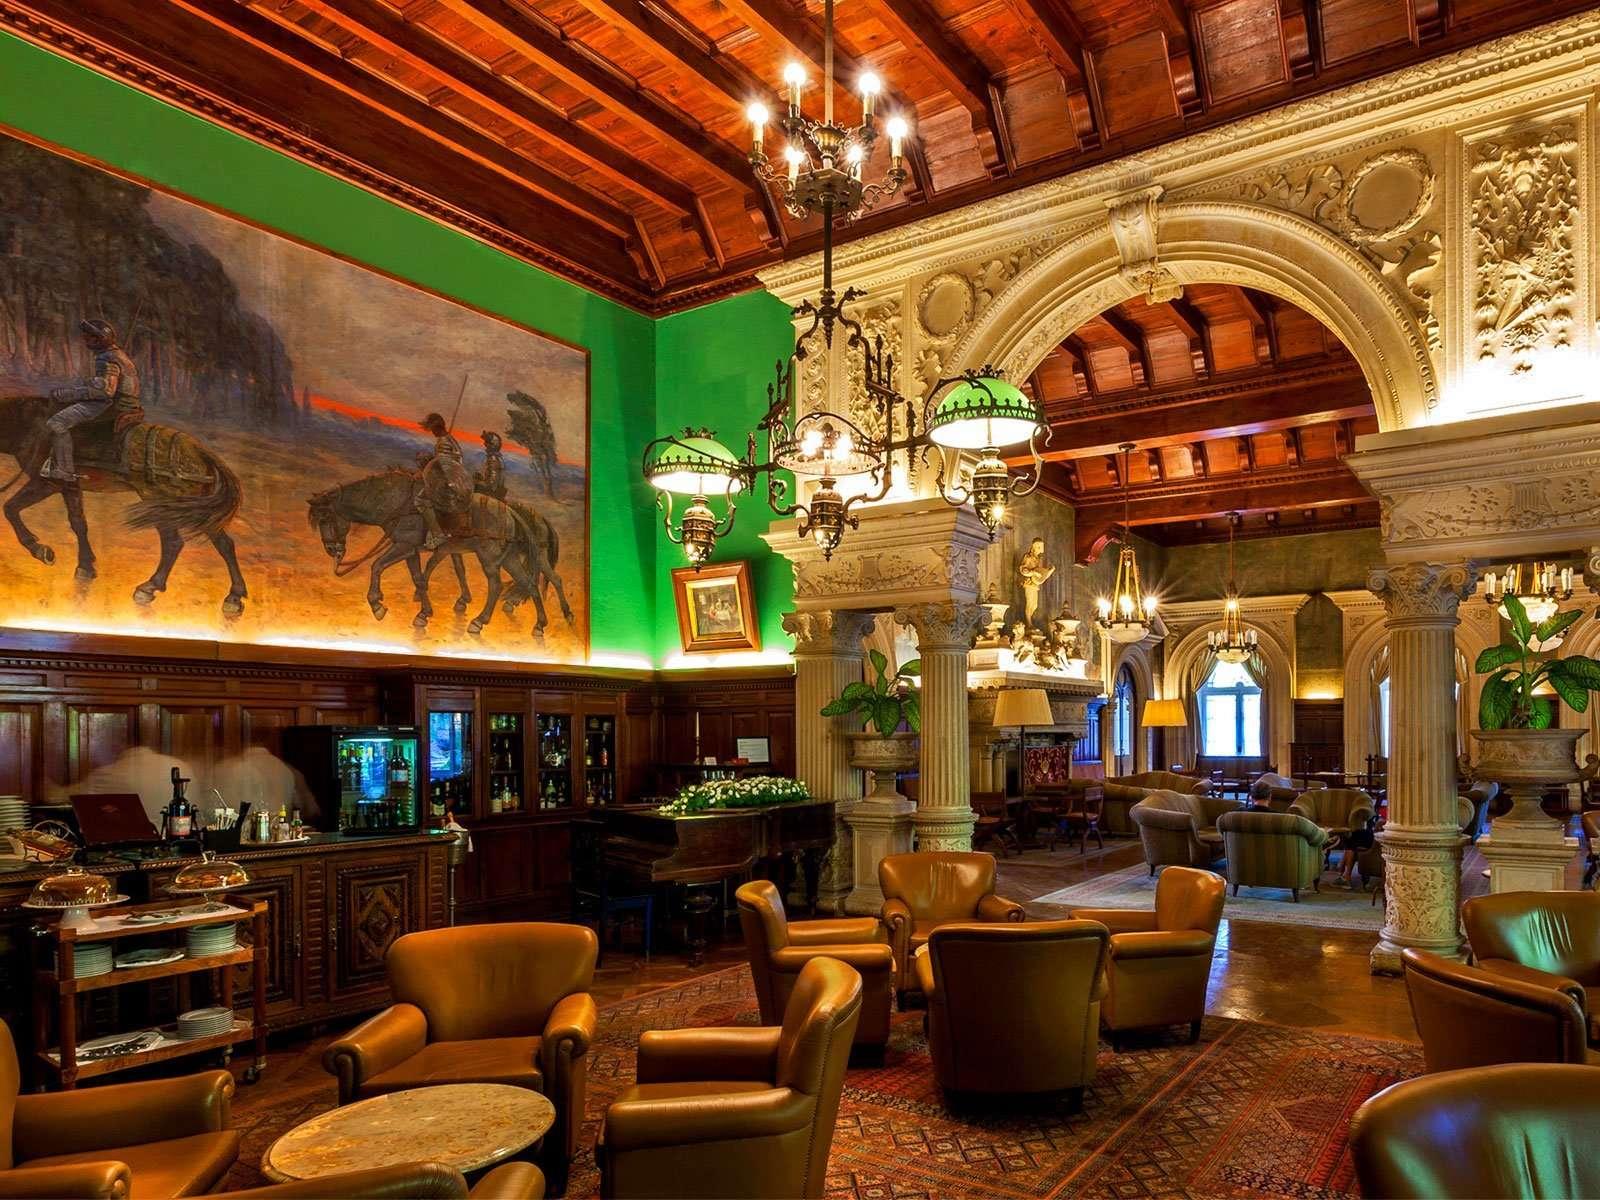 Bussaco Palace hotel - Buçaco